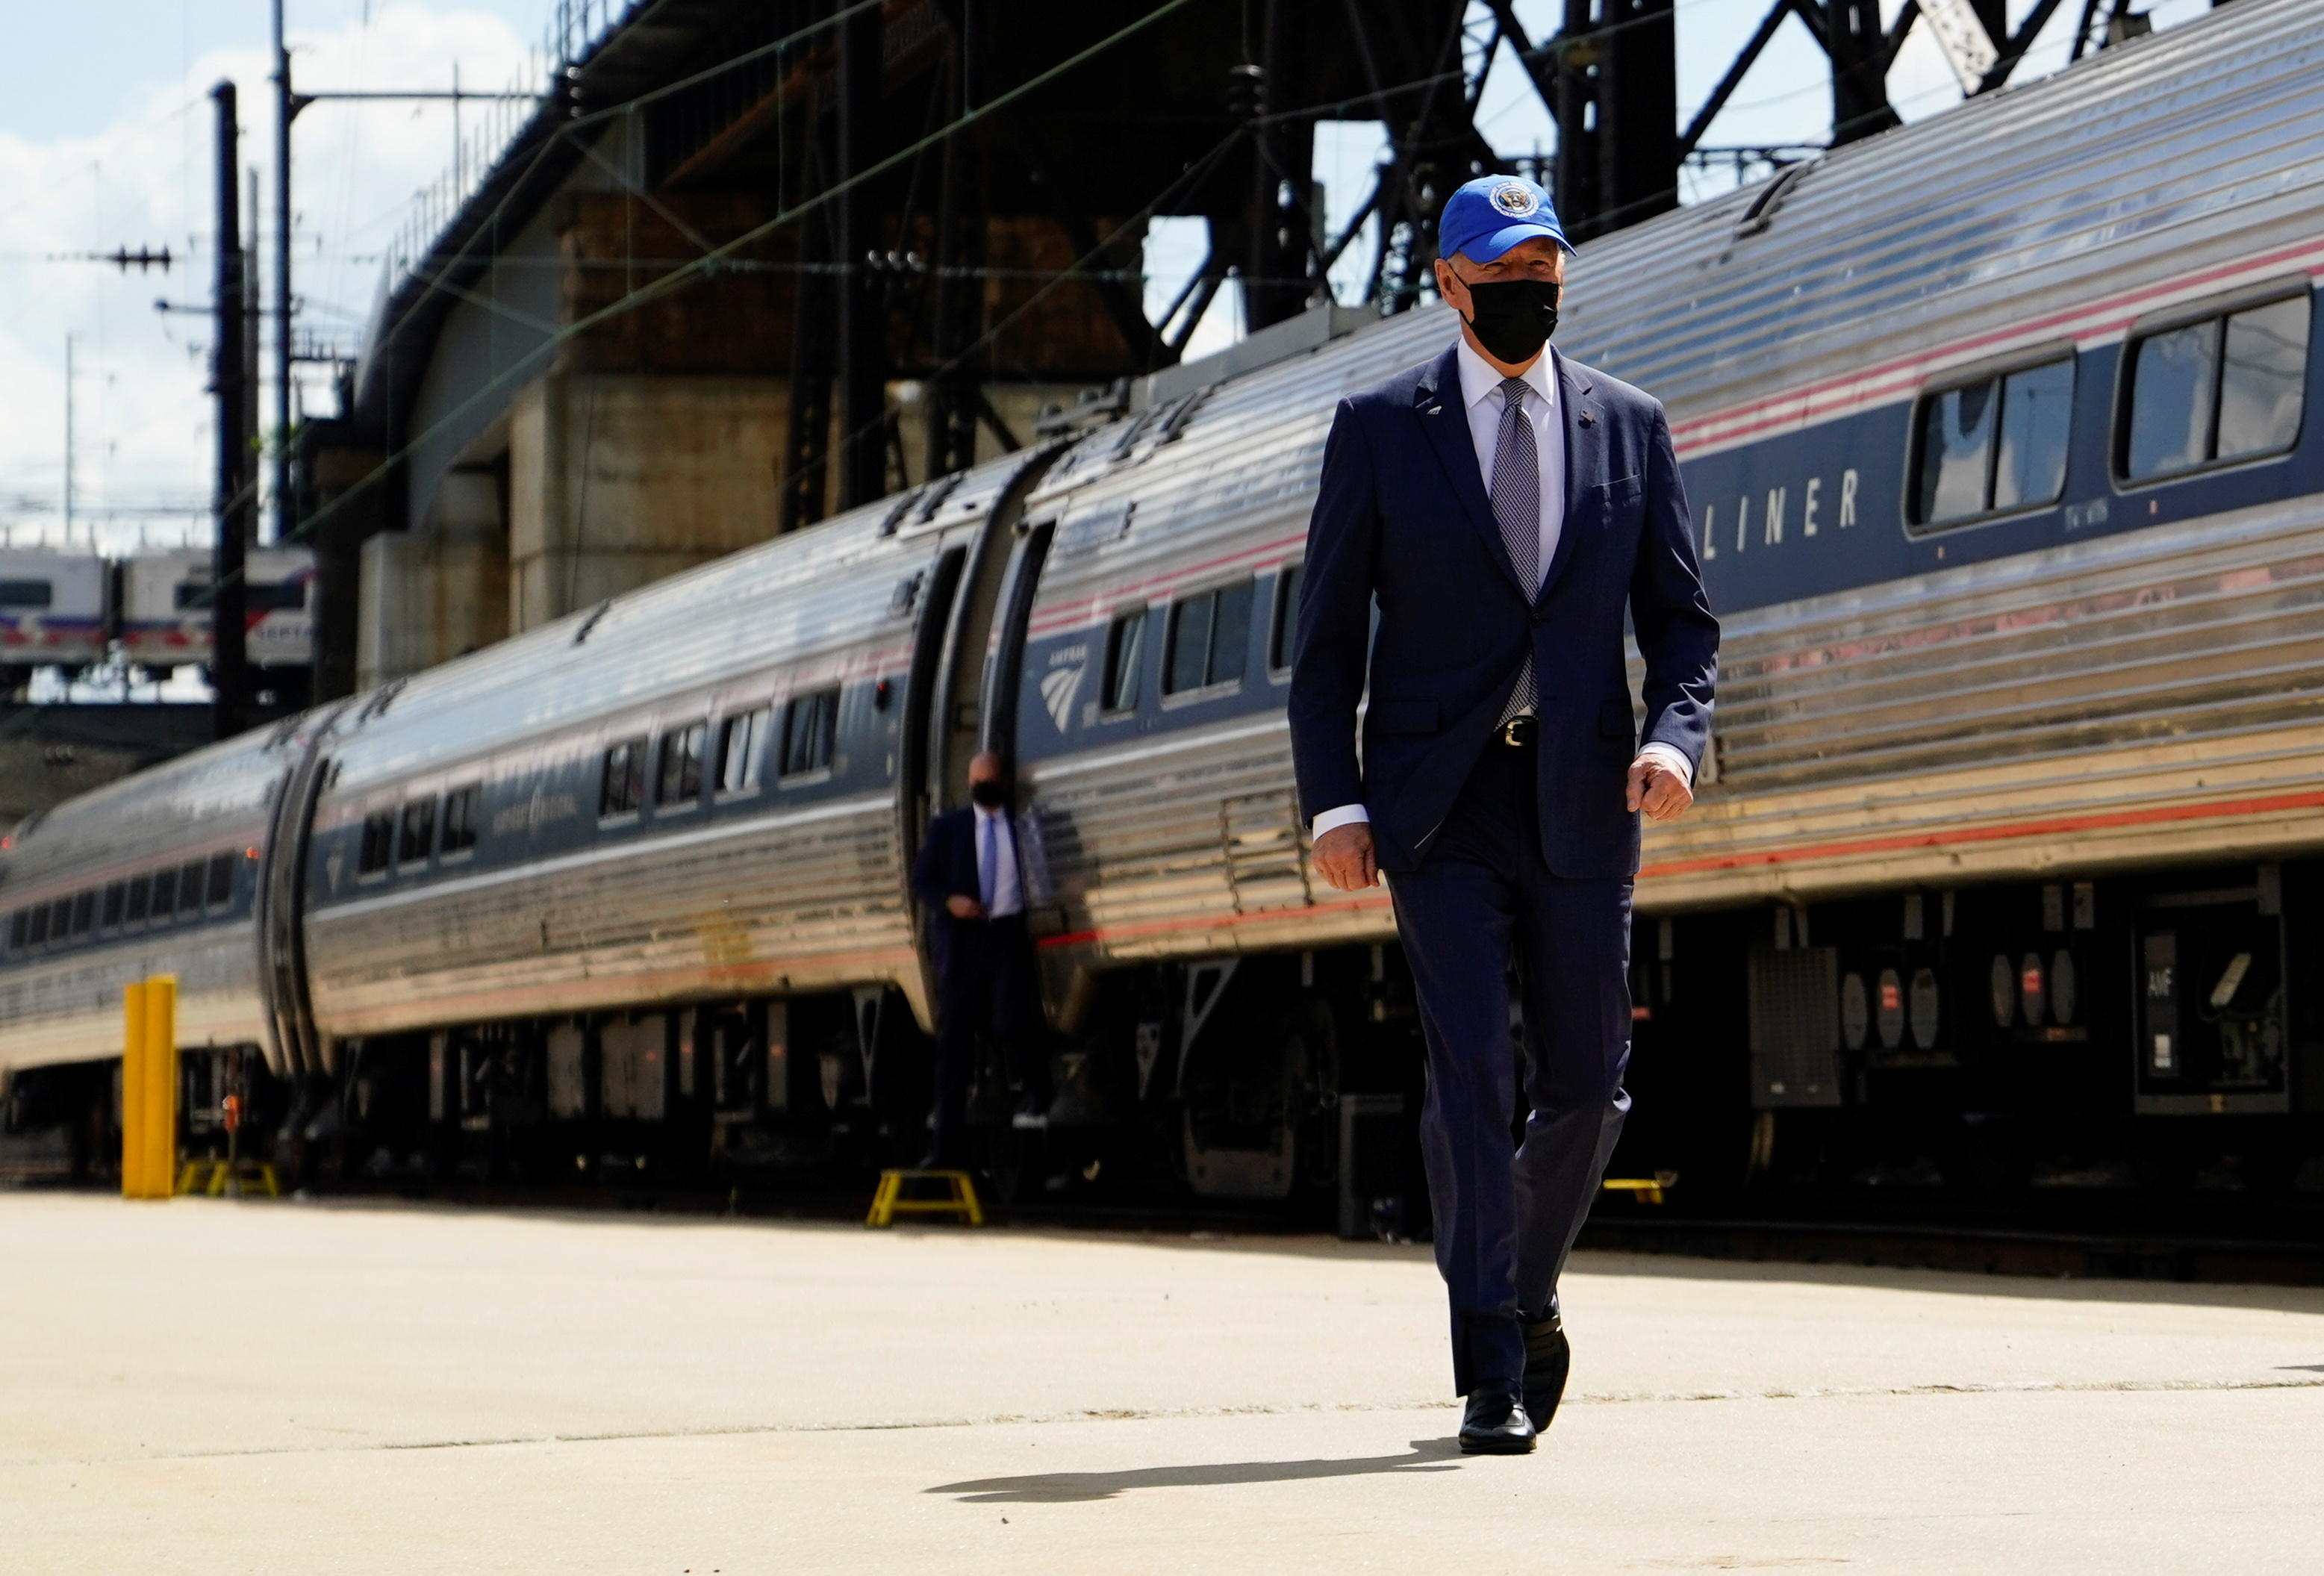 U.S. President Joe Biden arrives for an event marking Amtrak's 50th Anniversary, at the 30th Street Station in Philadelphia, Pennsylvania, U.S., April 30, 2021. REUTERS/Erin Scott